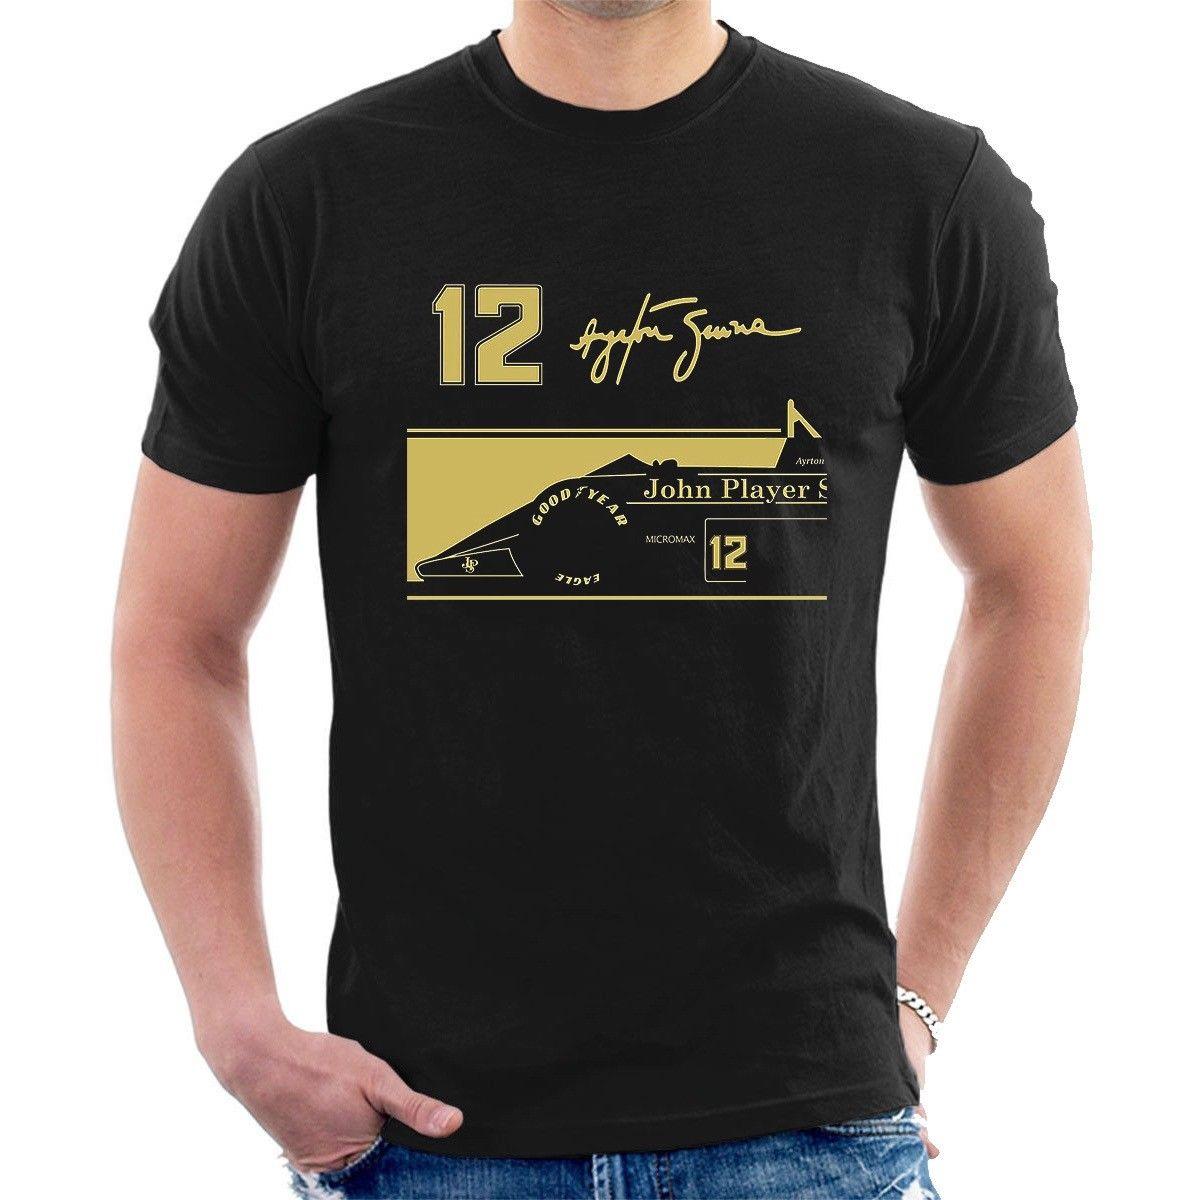 2018 New Fashion Casual Men T Shirt Novelty O-Neck Tops Ayrton Senna Jps Tribute T-Shirt 12 Signature Bulk T Shirts